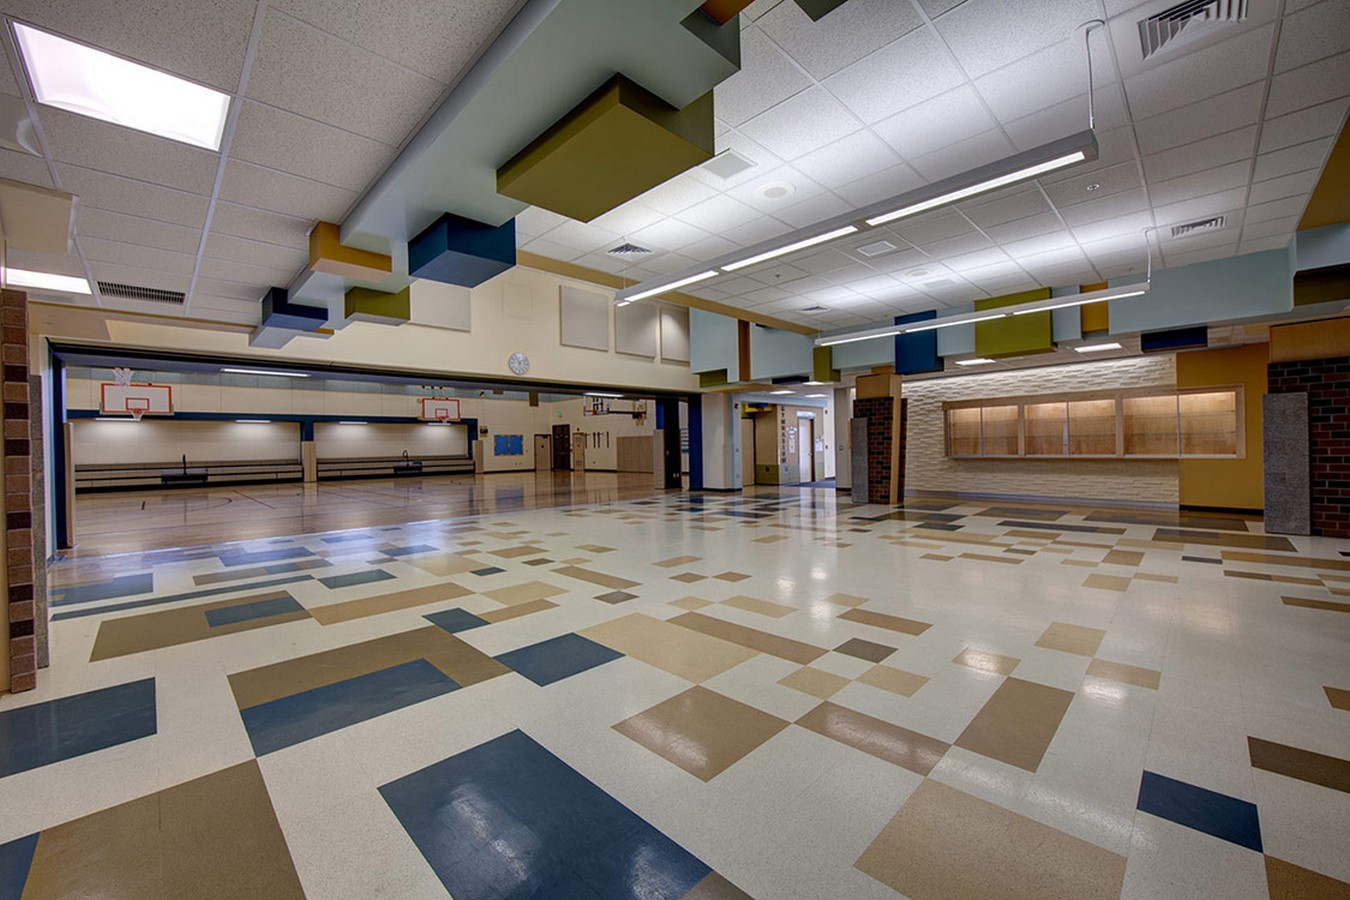 PARK ORCHID ELEMENTARY SCHOOL - Sheet3